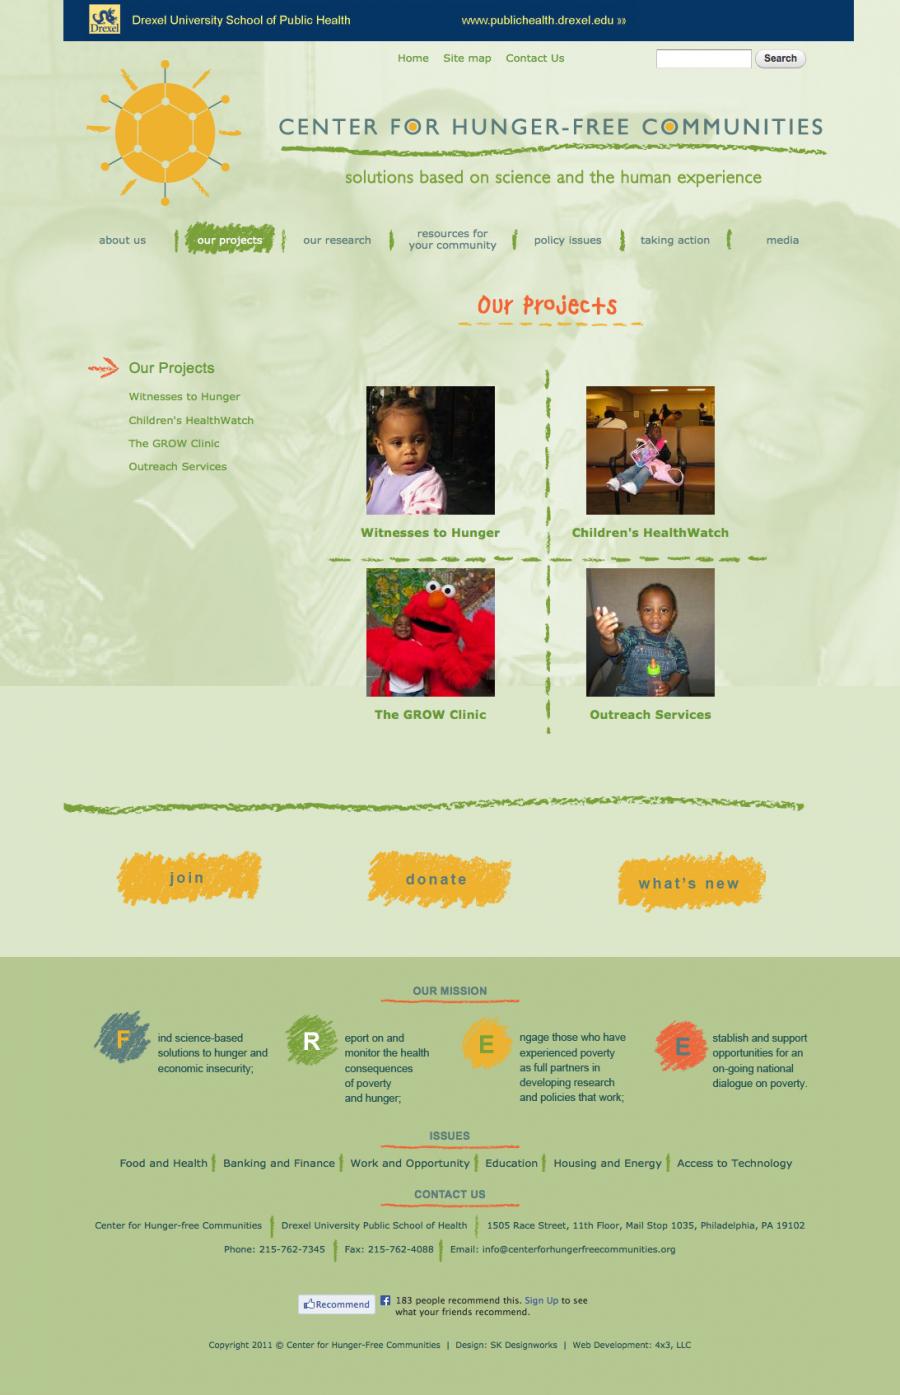 The Center for Hunger-Free Communities Website, part of Drexel University's School of Public Health